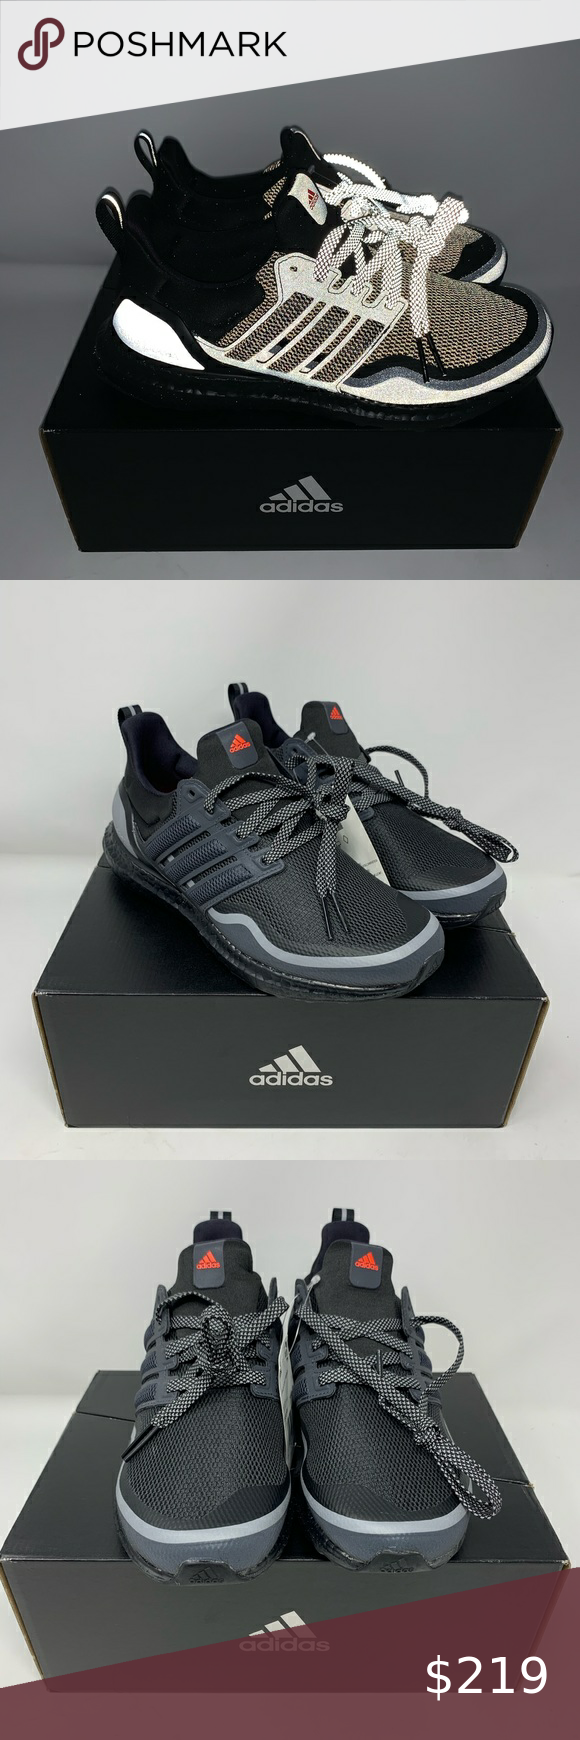 NEW Adidas UltraBoost Ultra Boost